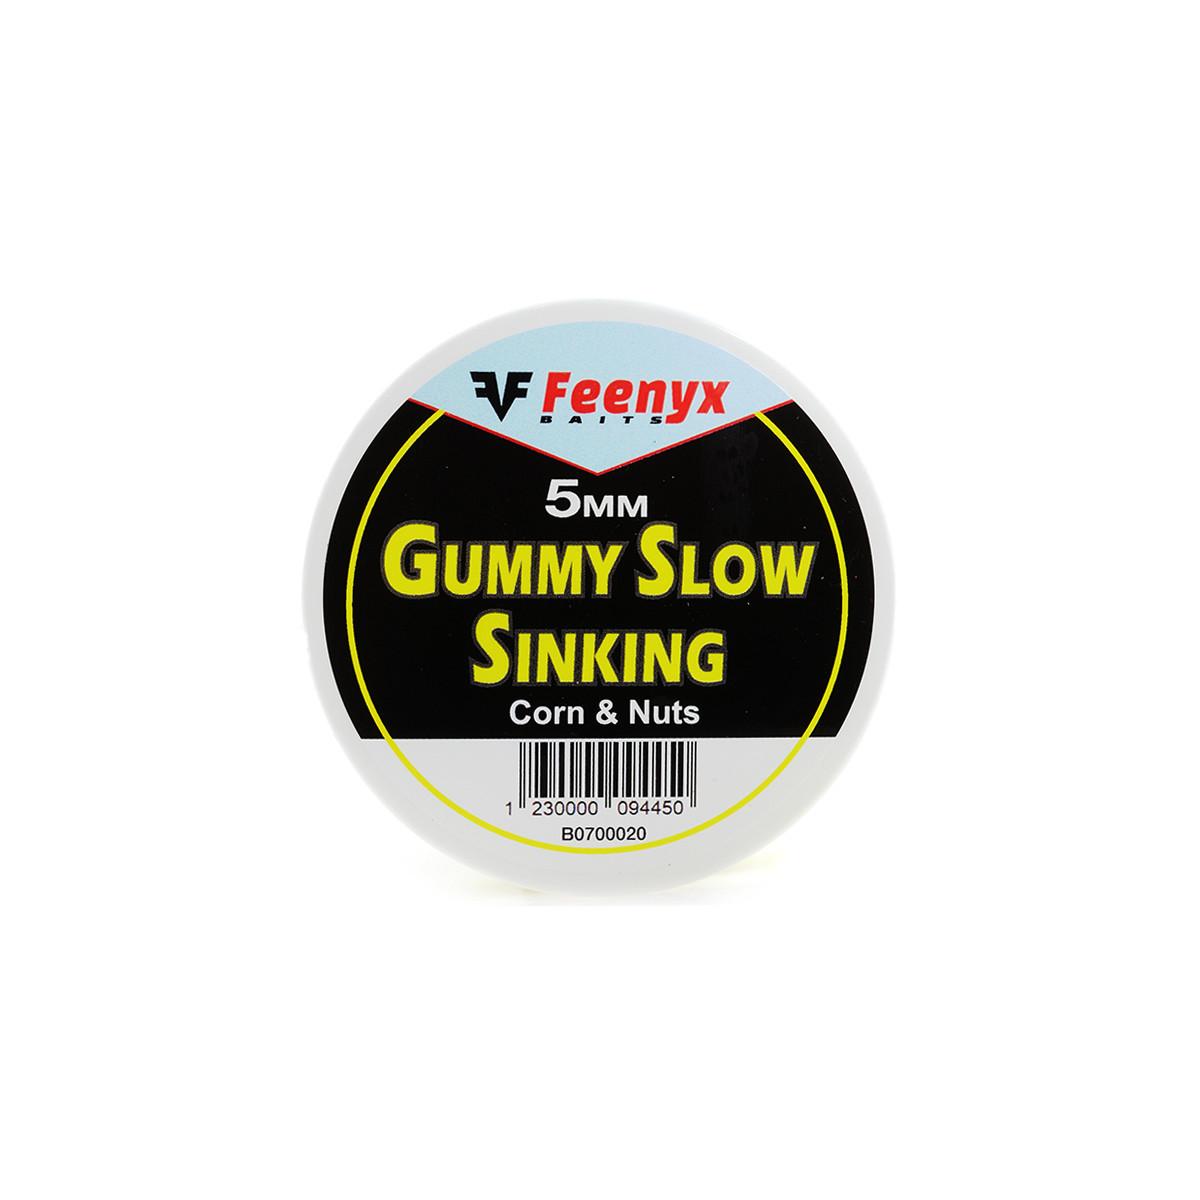 FEENYX GUMMY SLOW SINKING